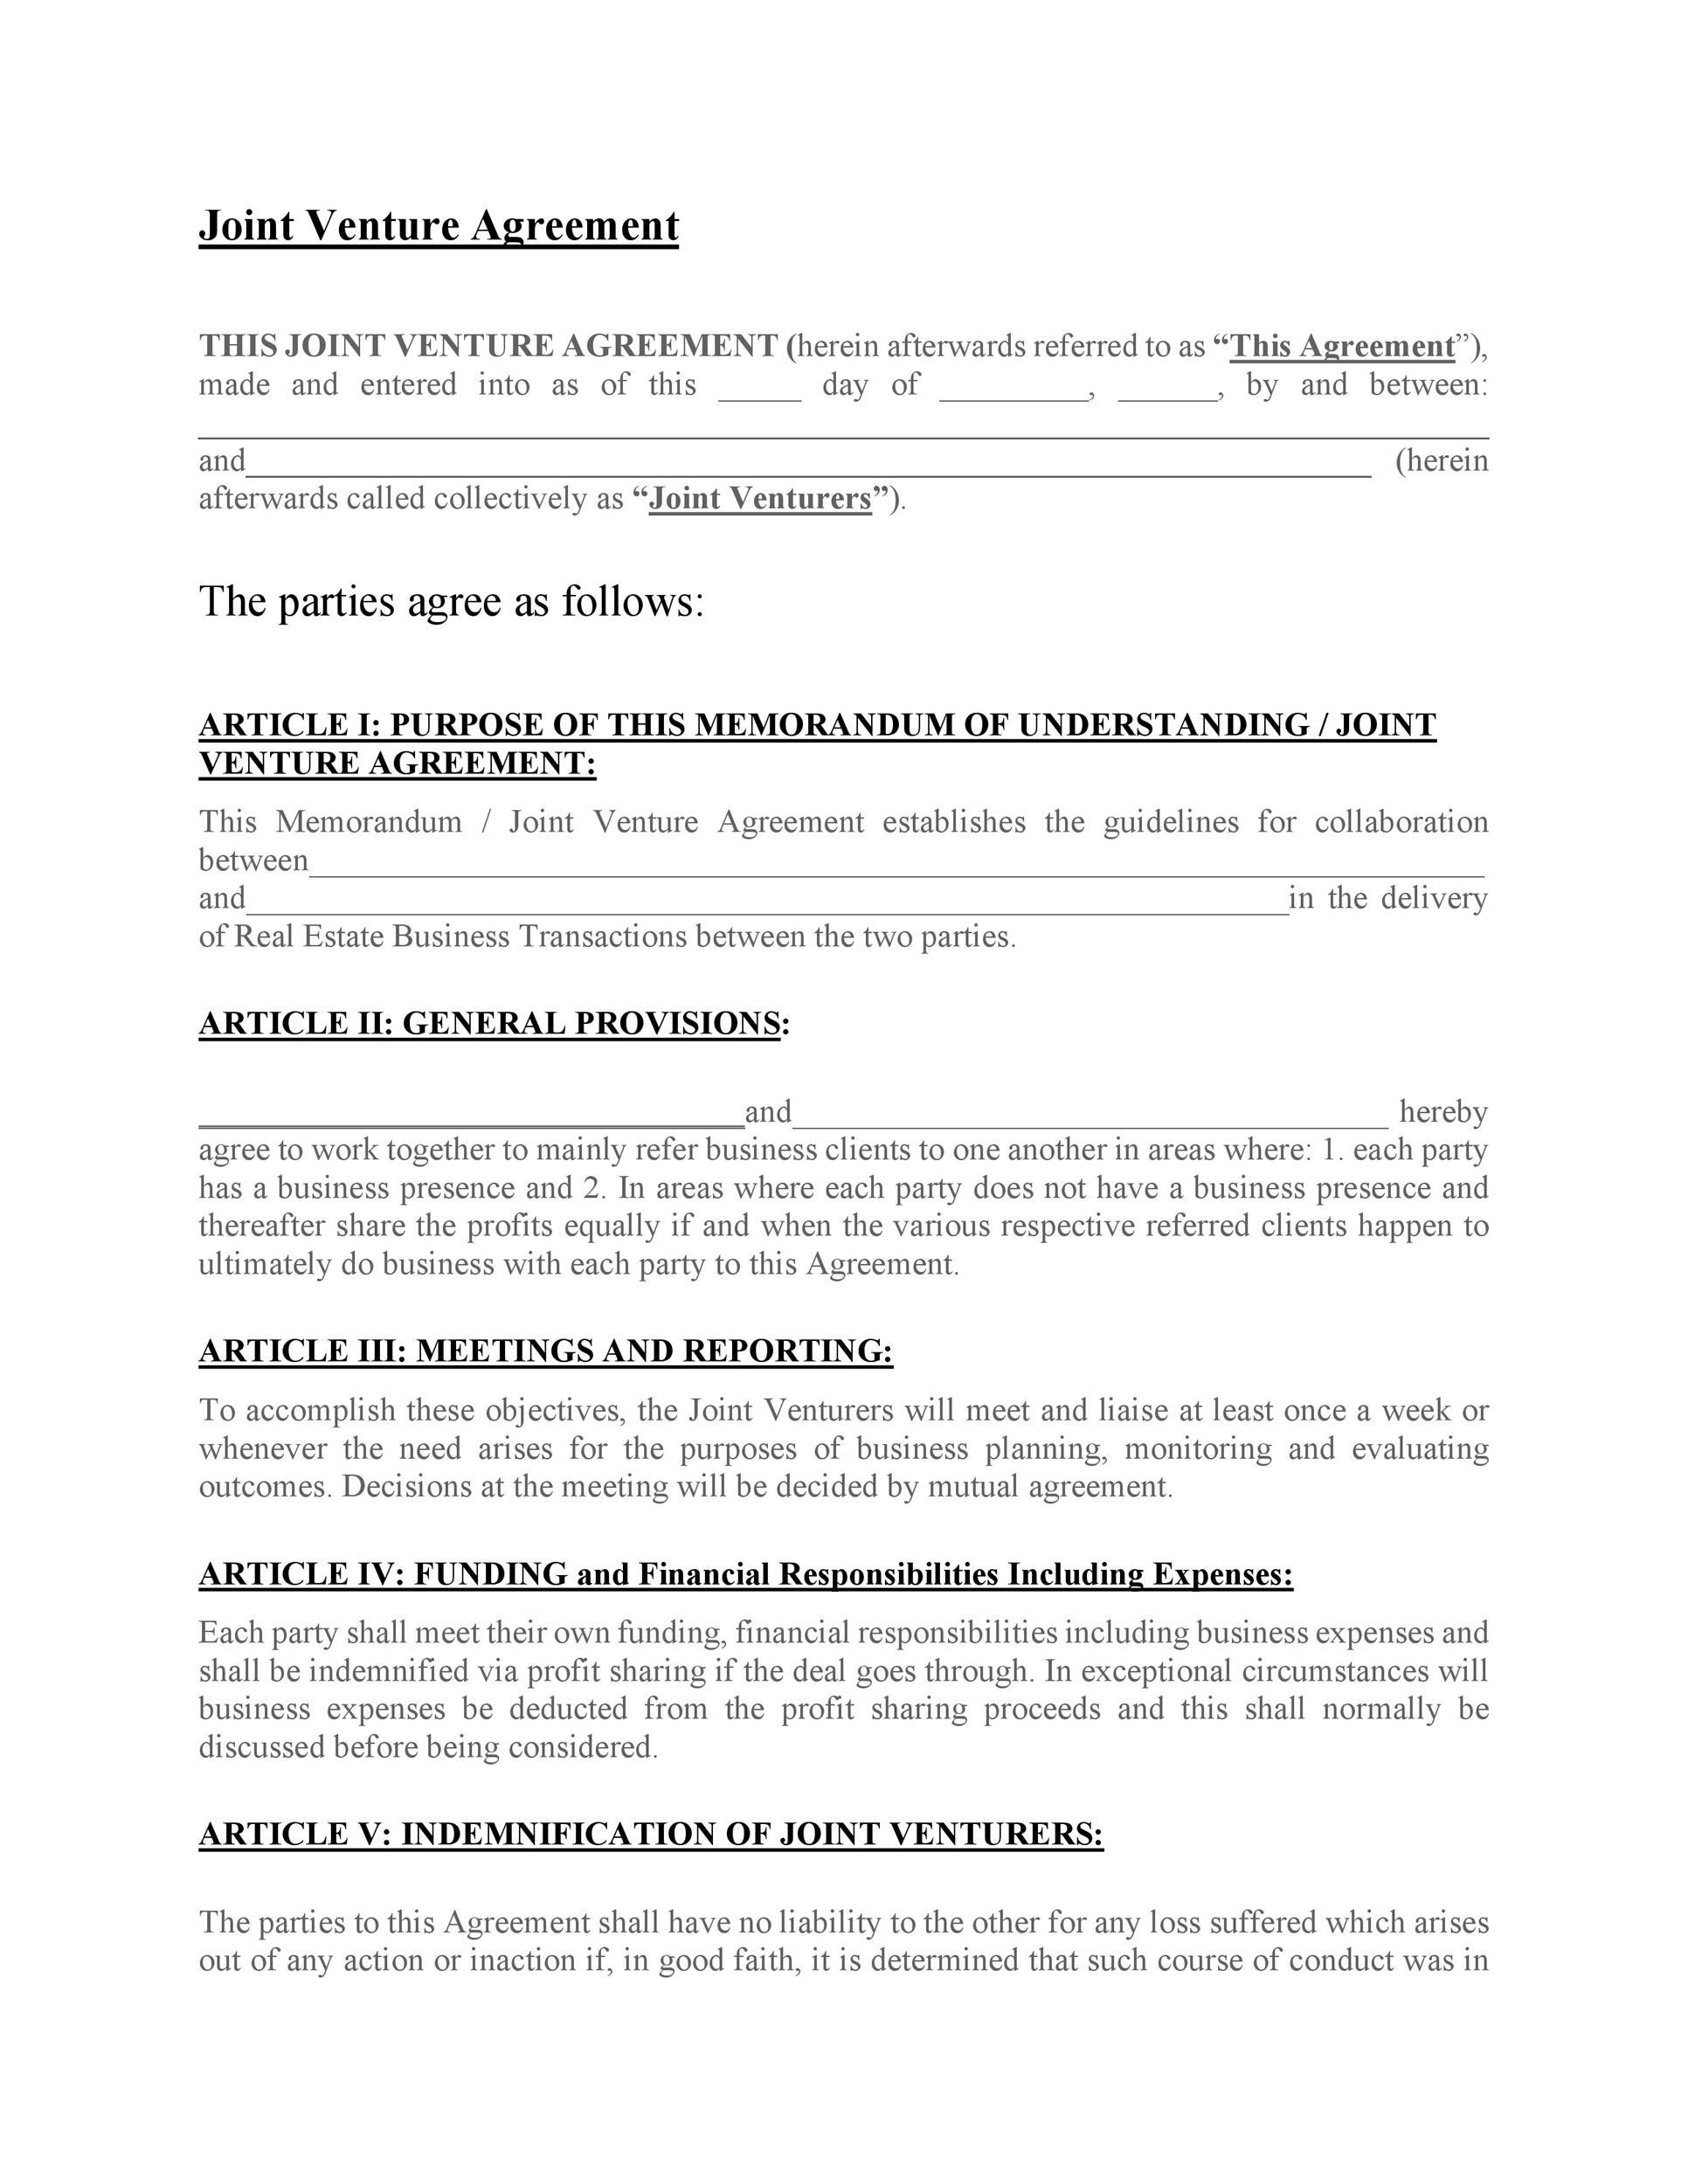 53 Simple Joint Venture Agreement Templates Pdf Doc ᐅ Templatelab